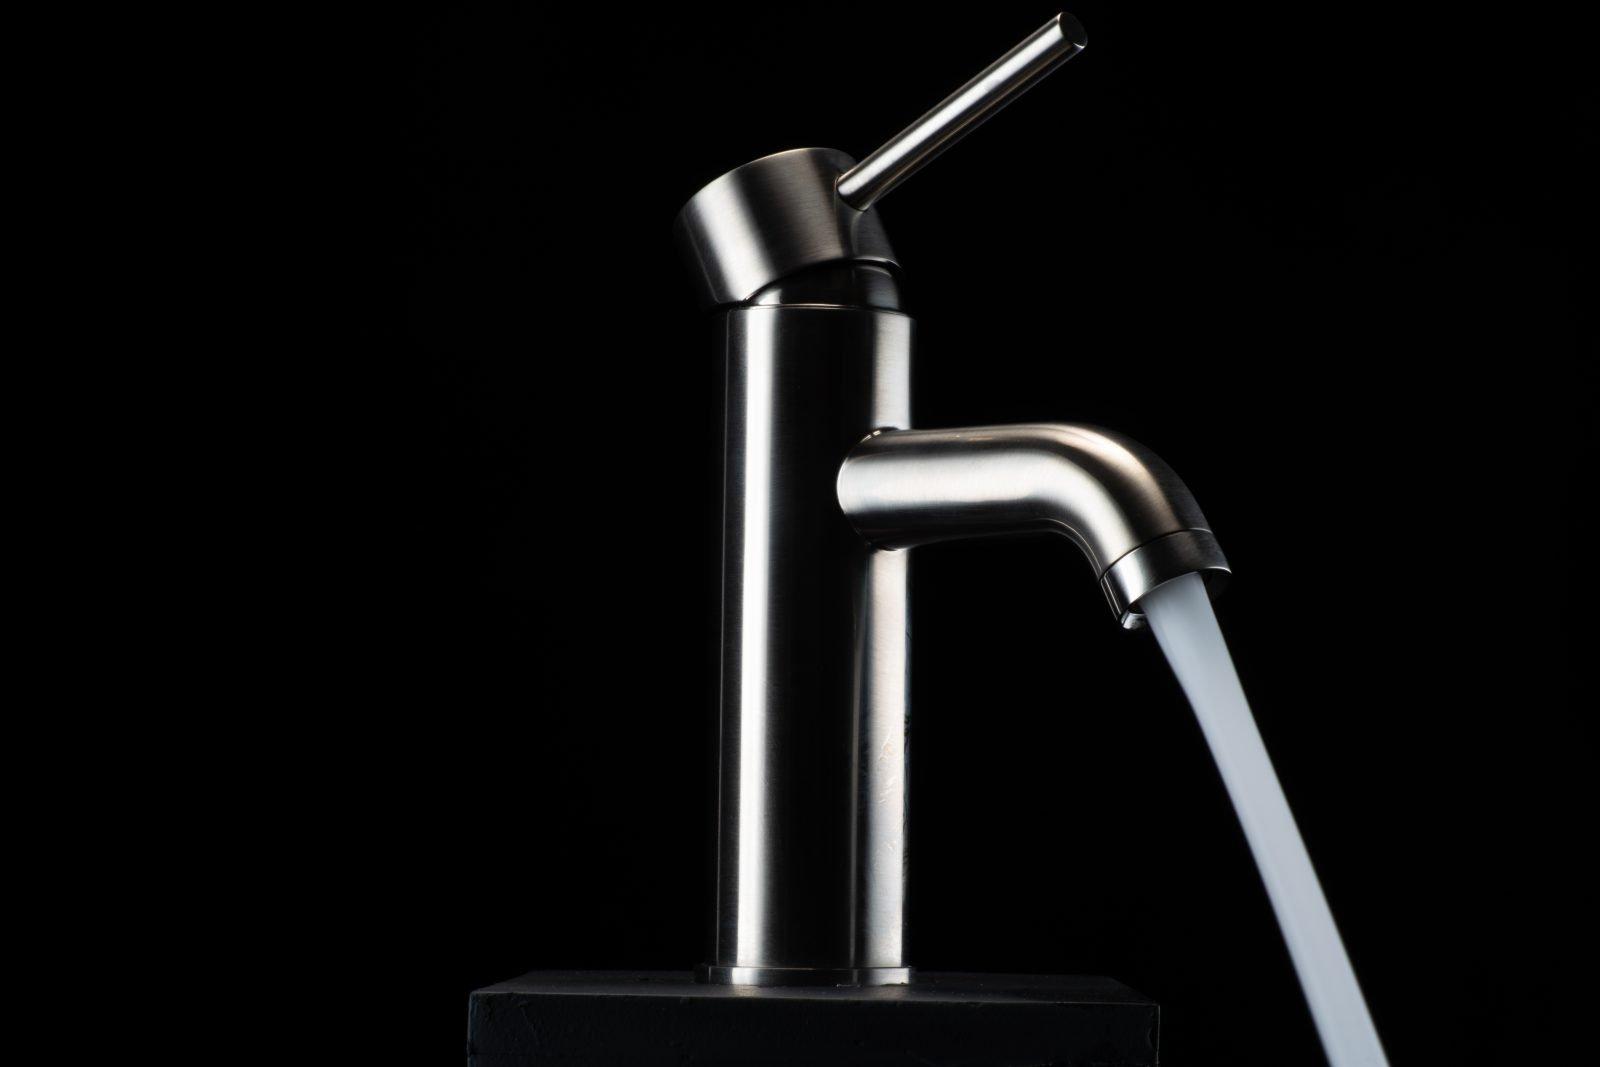 BP11 - Ghadira Satin Nickel wash hand basin